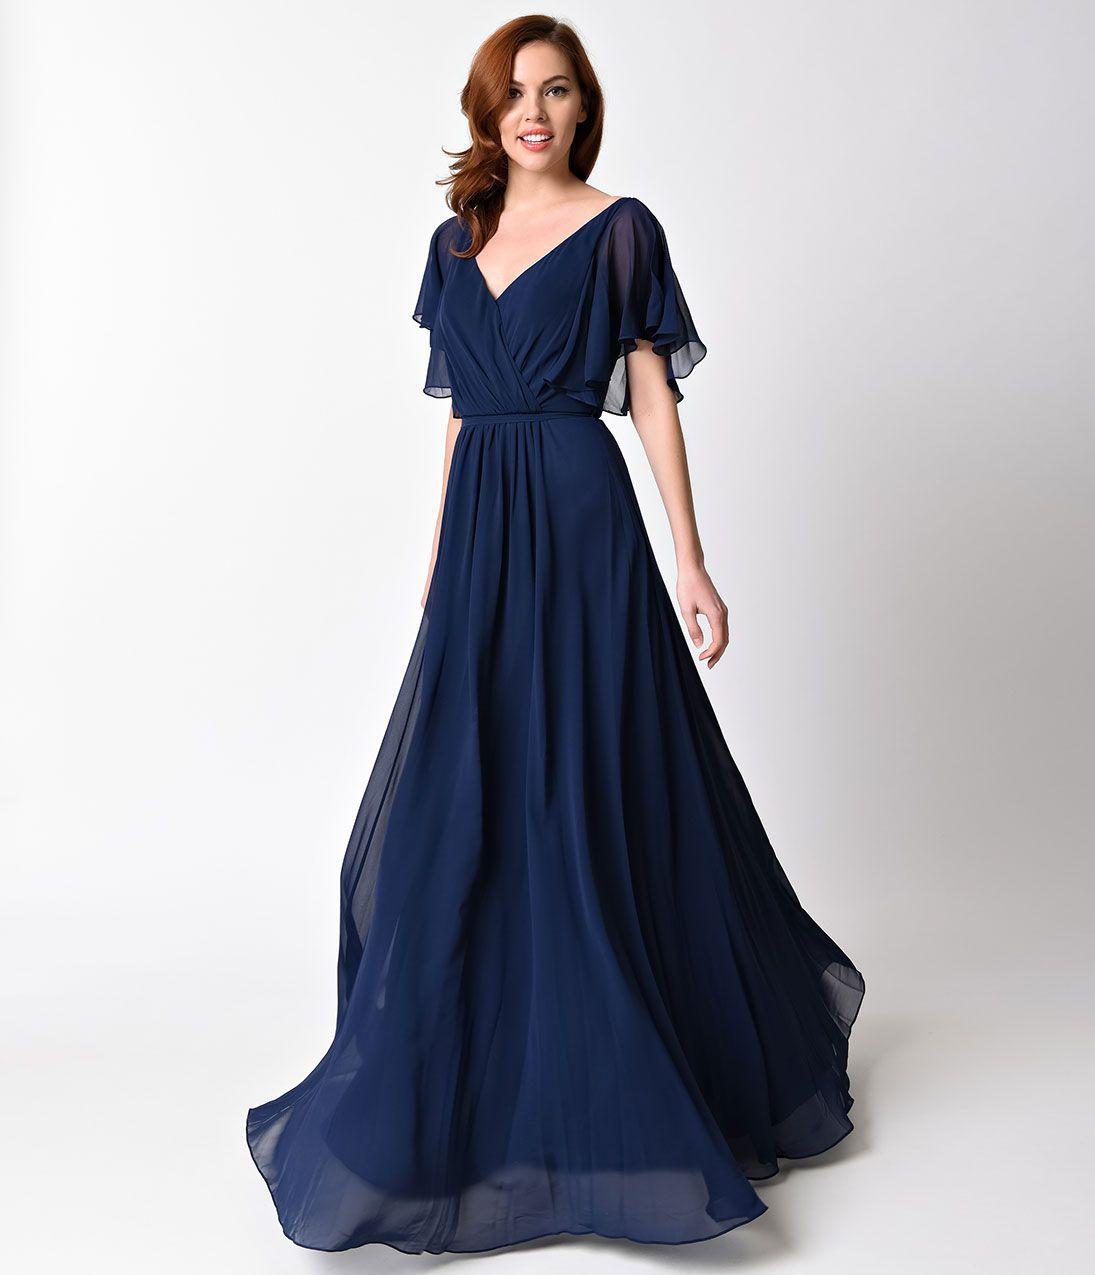 S evening dress art deco gown party dress blue blood